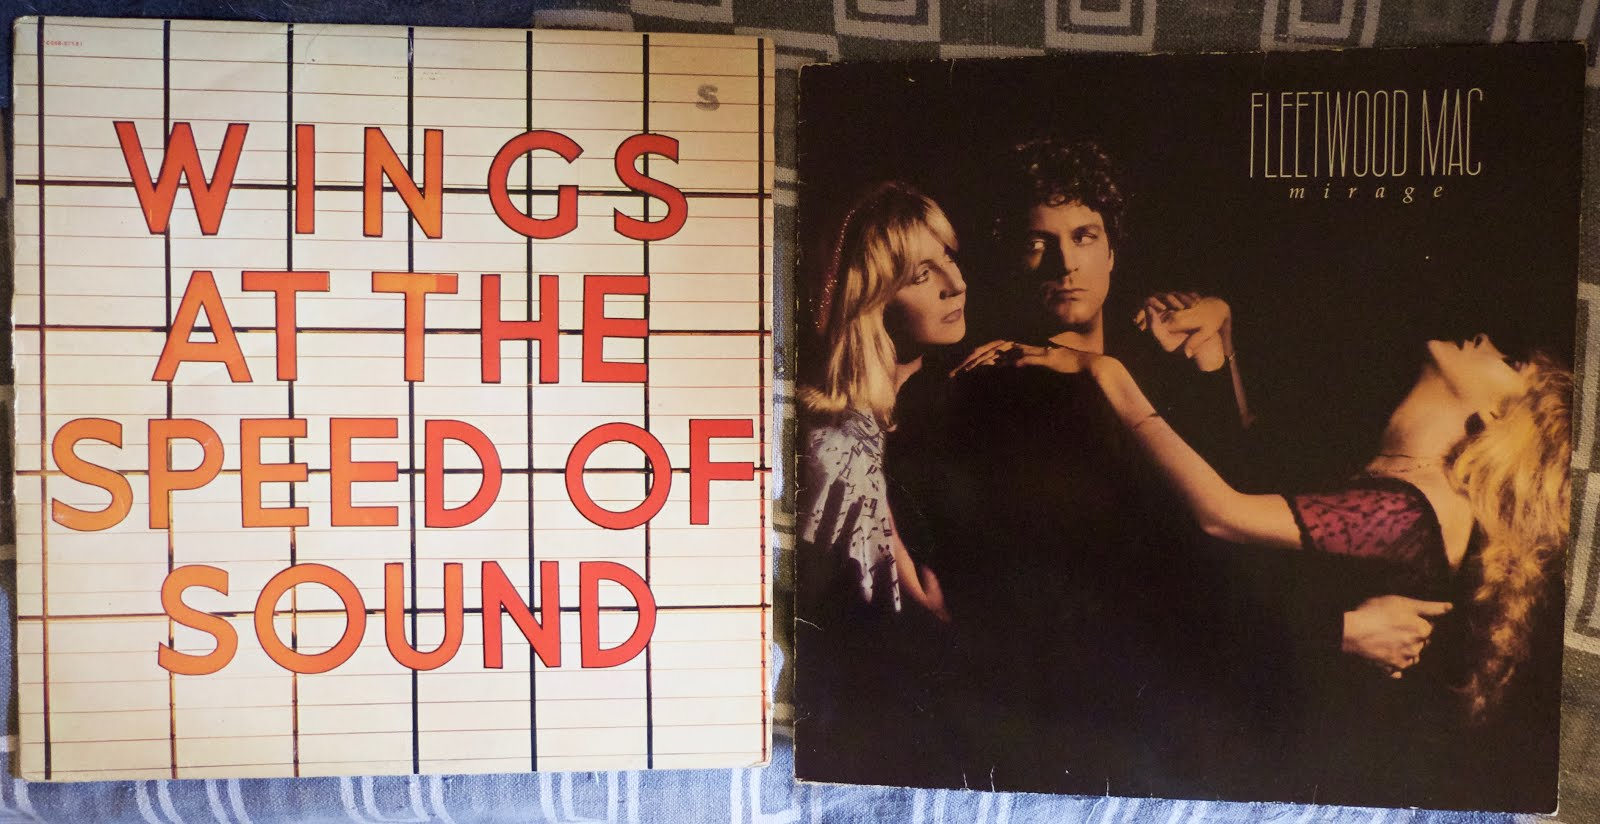 The Wings / Fleetwood Mac